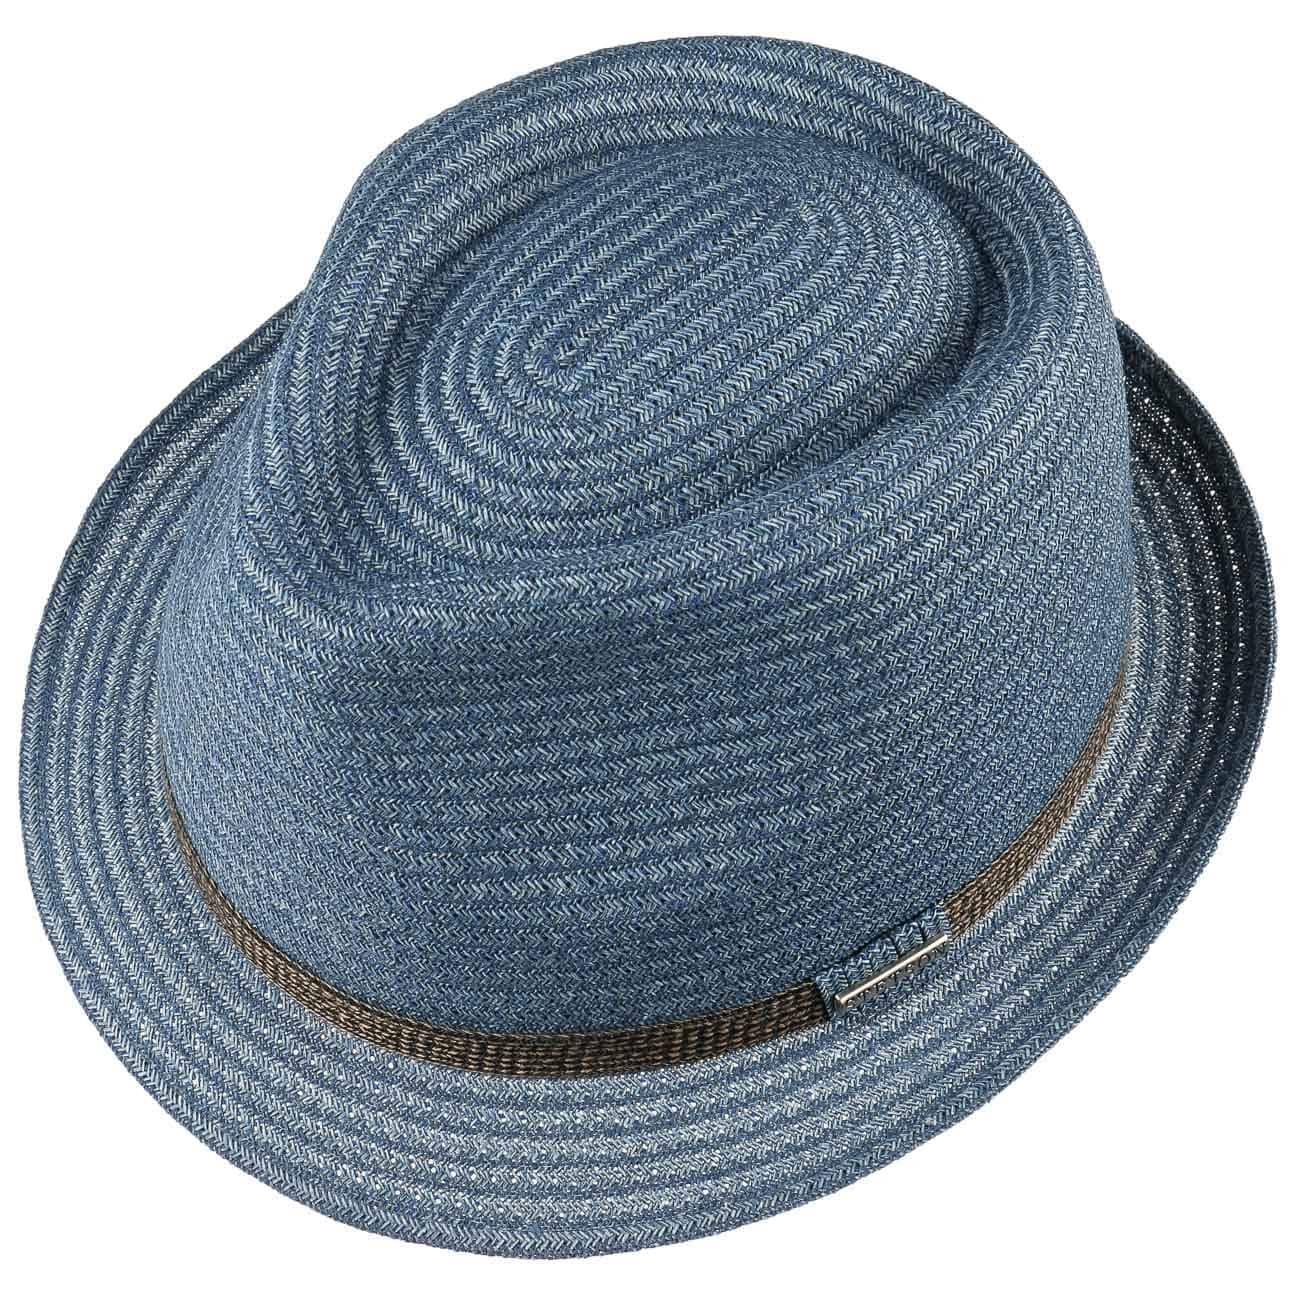 8c2aab69f2a Selden Toyo Trilby Straw Hat by Stetson - blue 2 ...